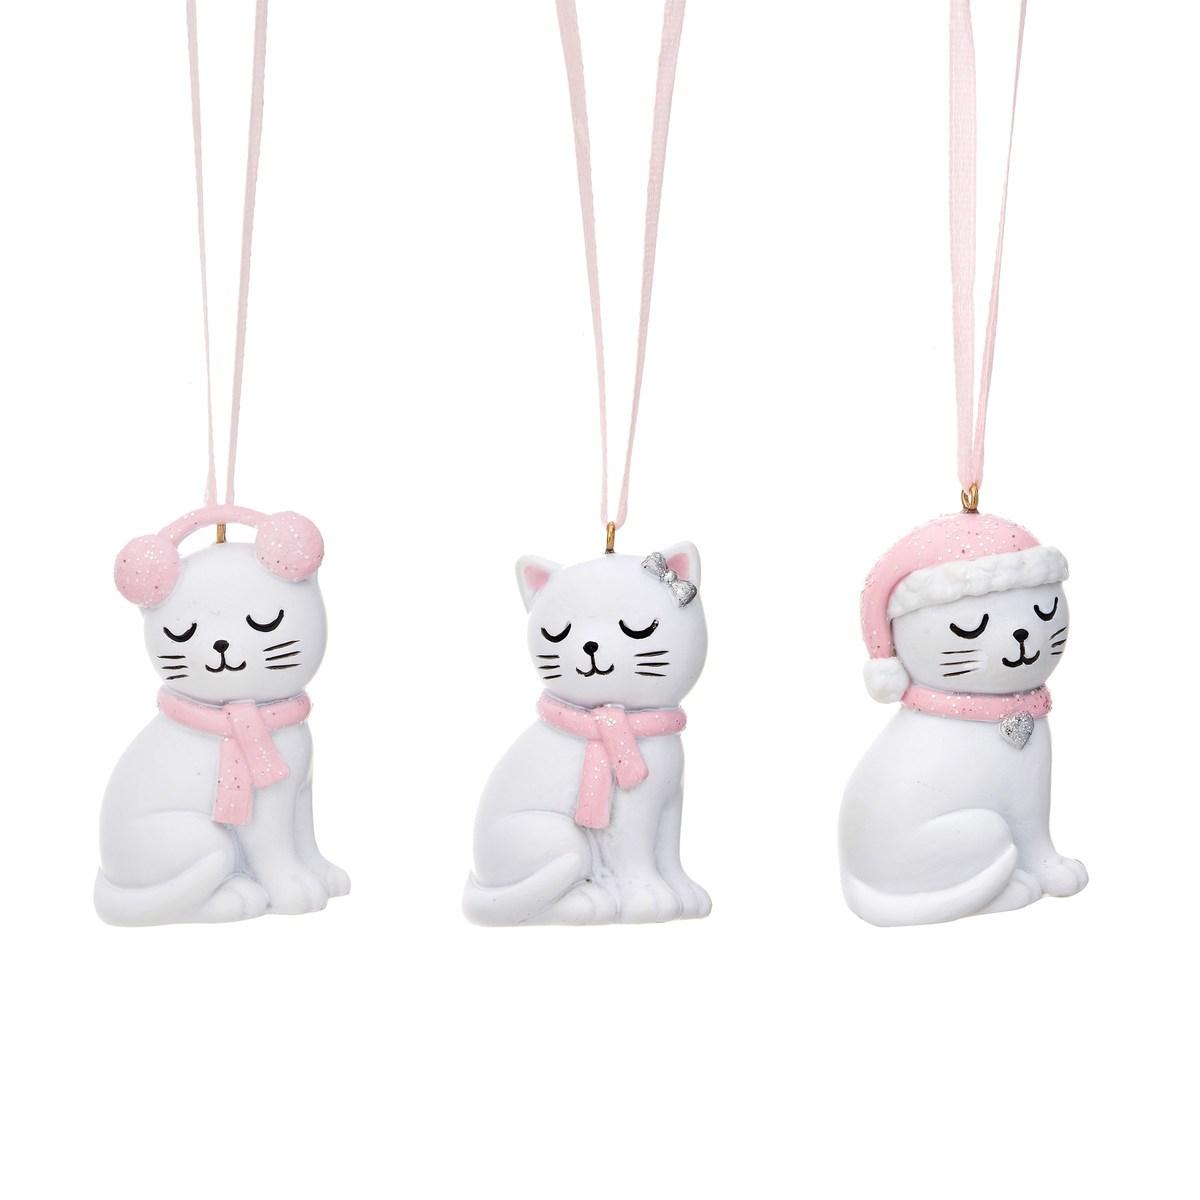 Dekorace na stromeček - kočičky - set 3 ks